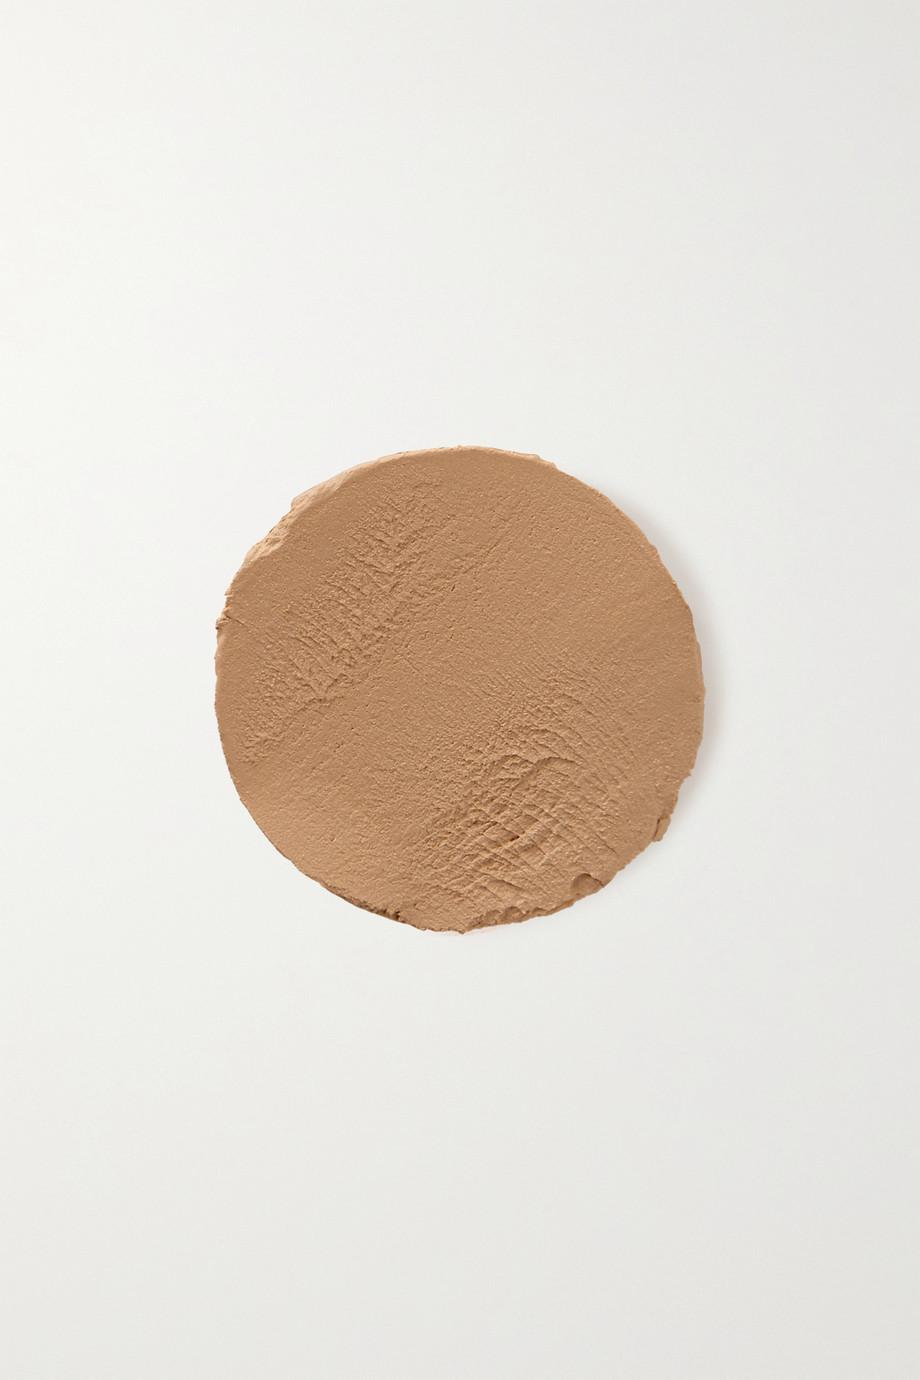 Westman Atelier Vital Skin Foundation Stick - Atelier X, 9g